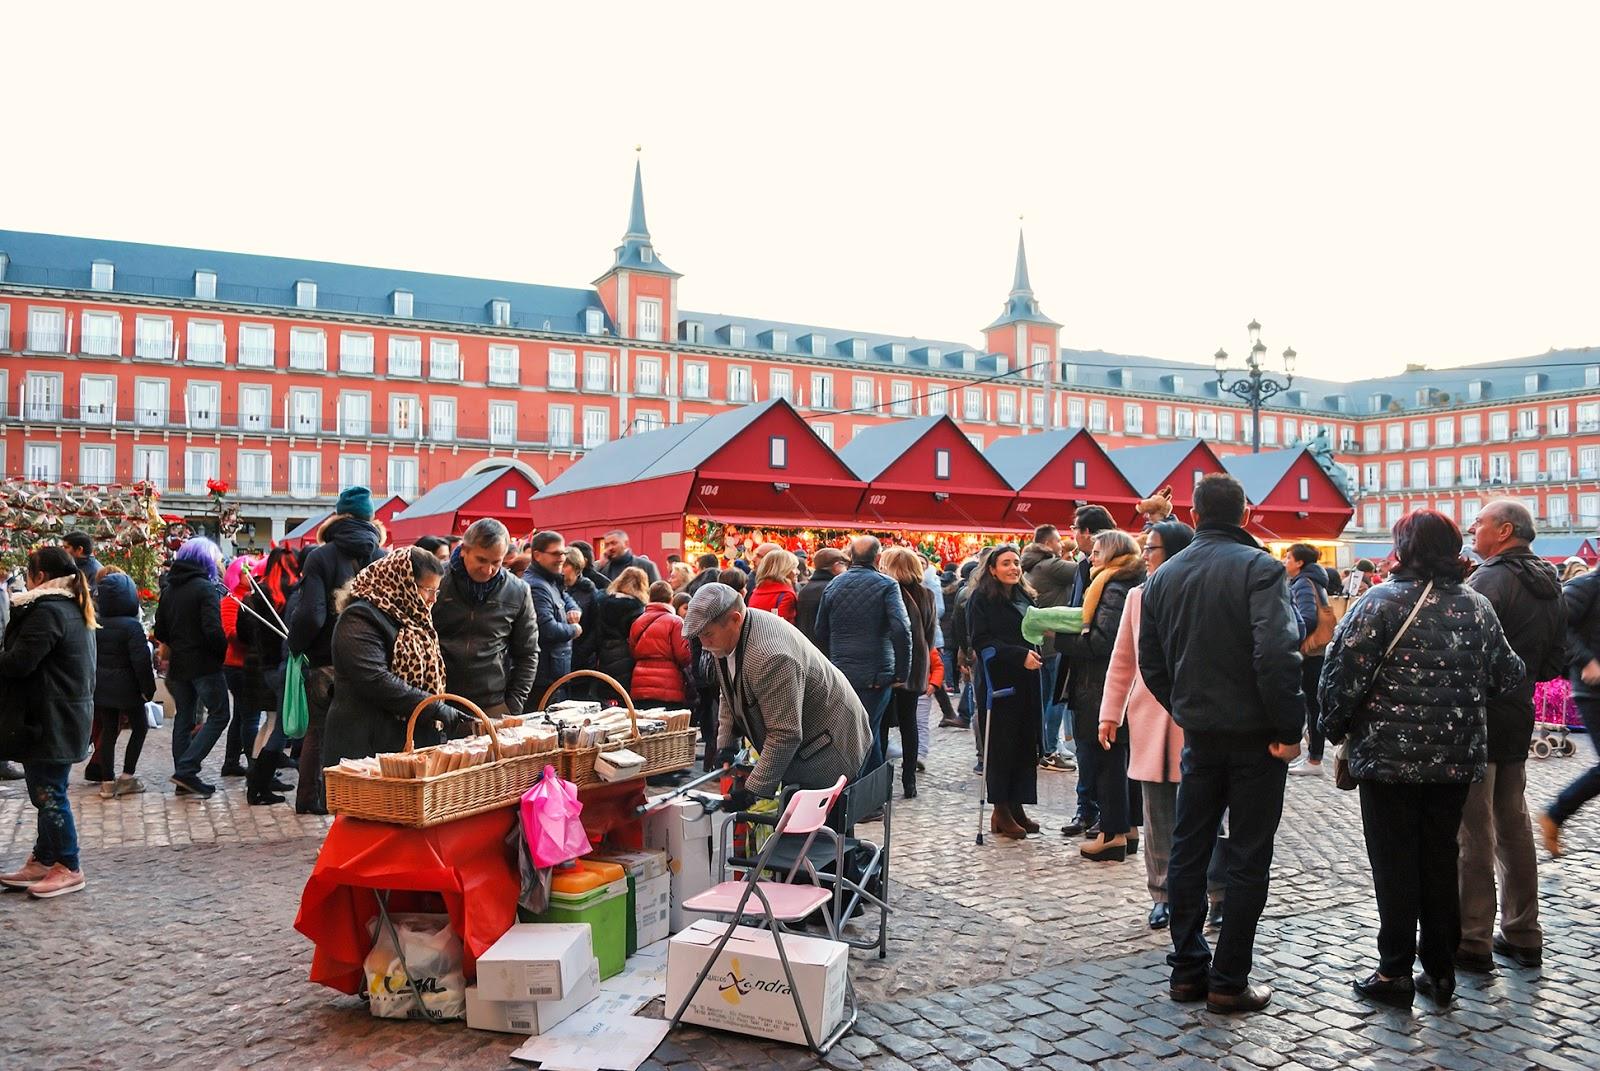 mercado plaza mayor madrid navidad christmas